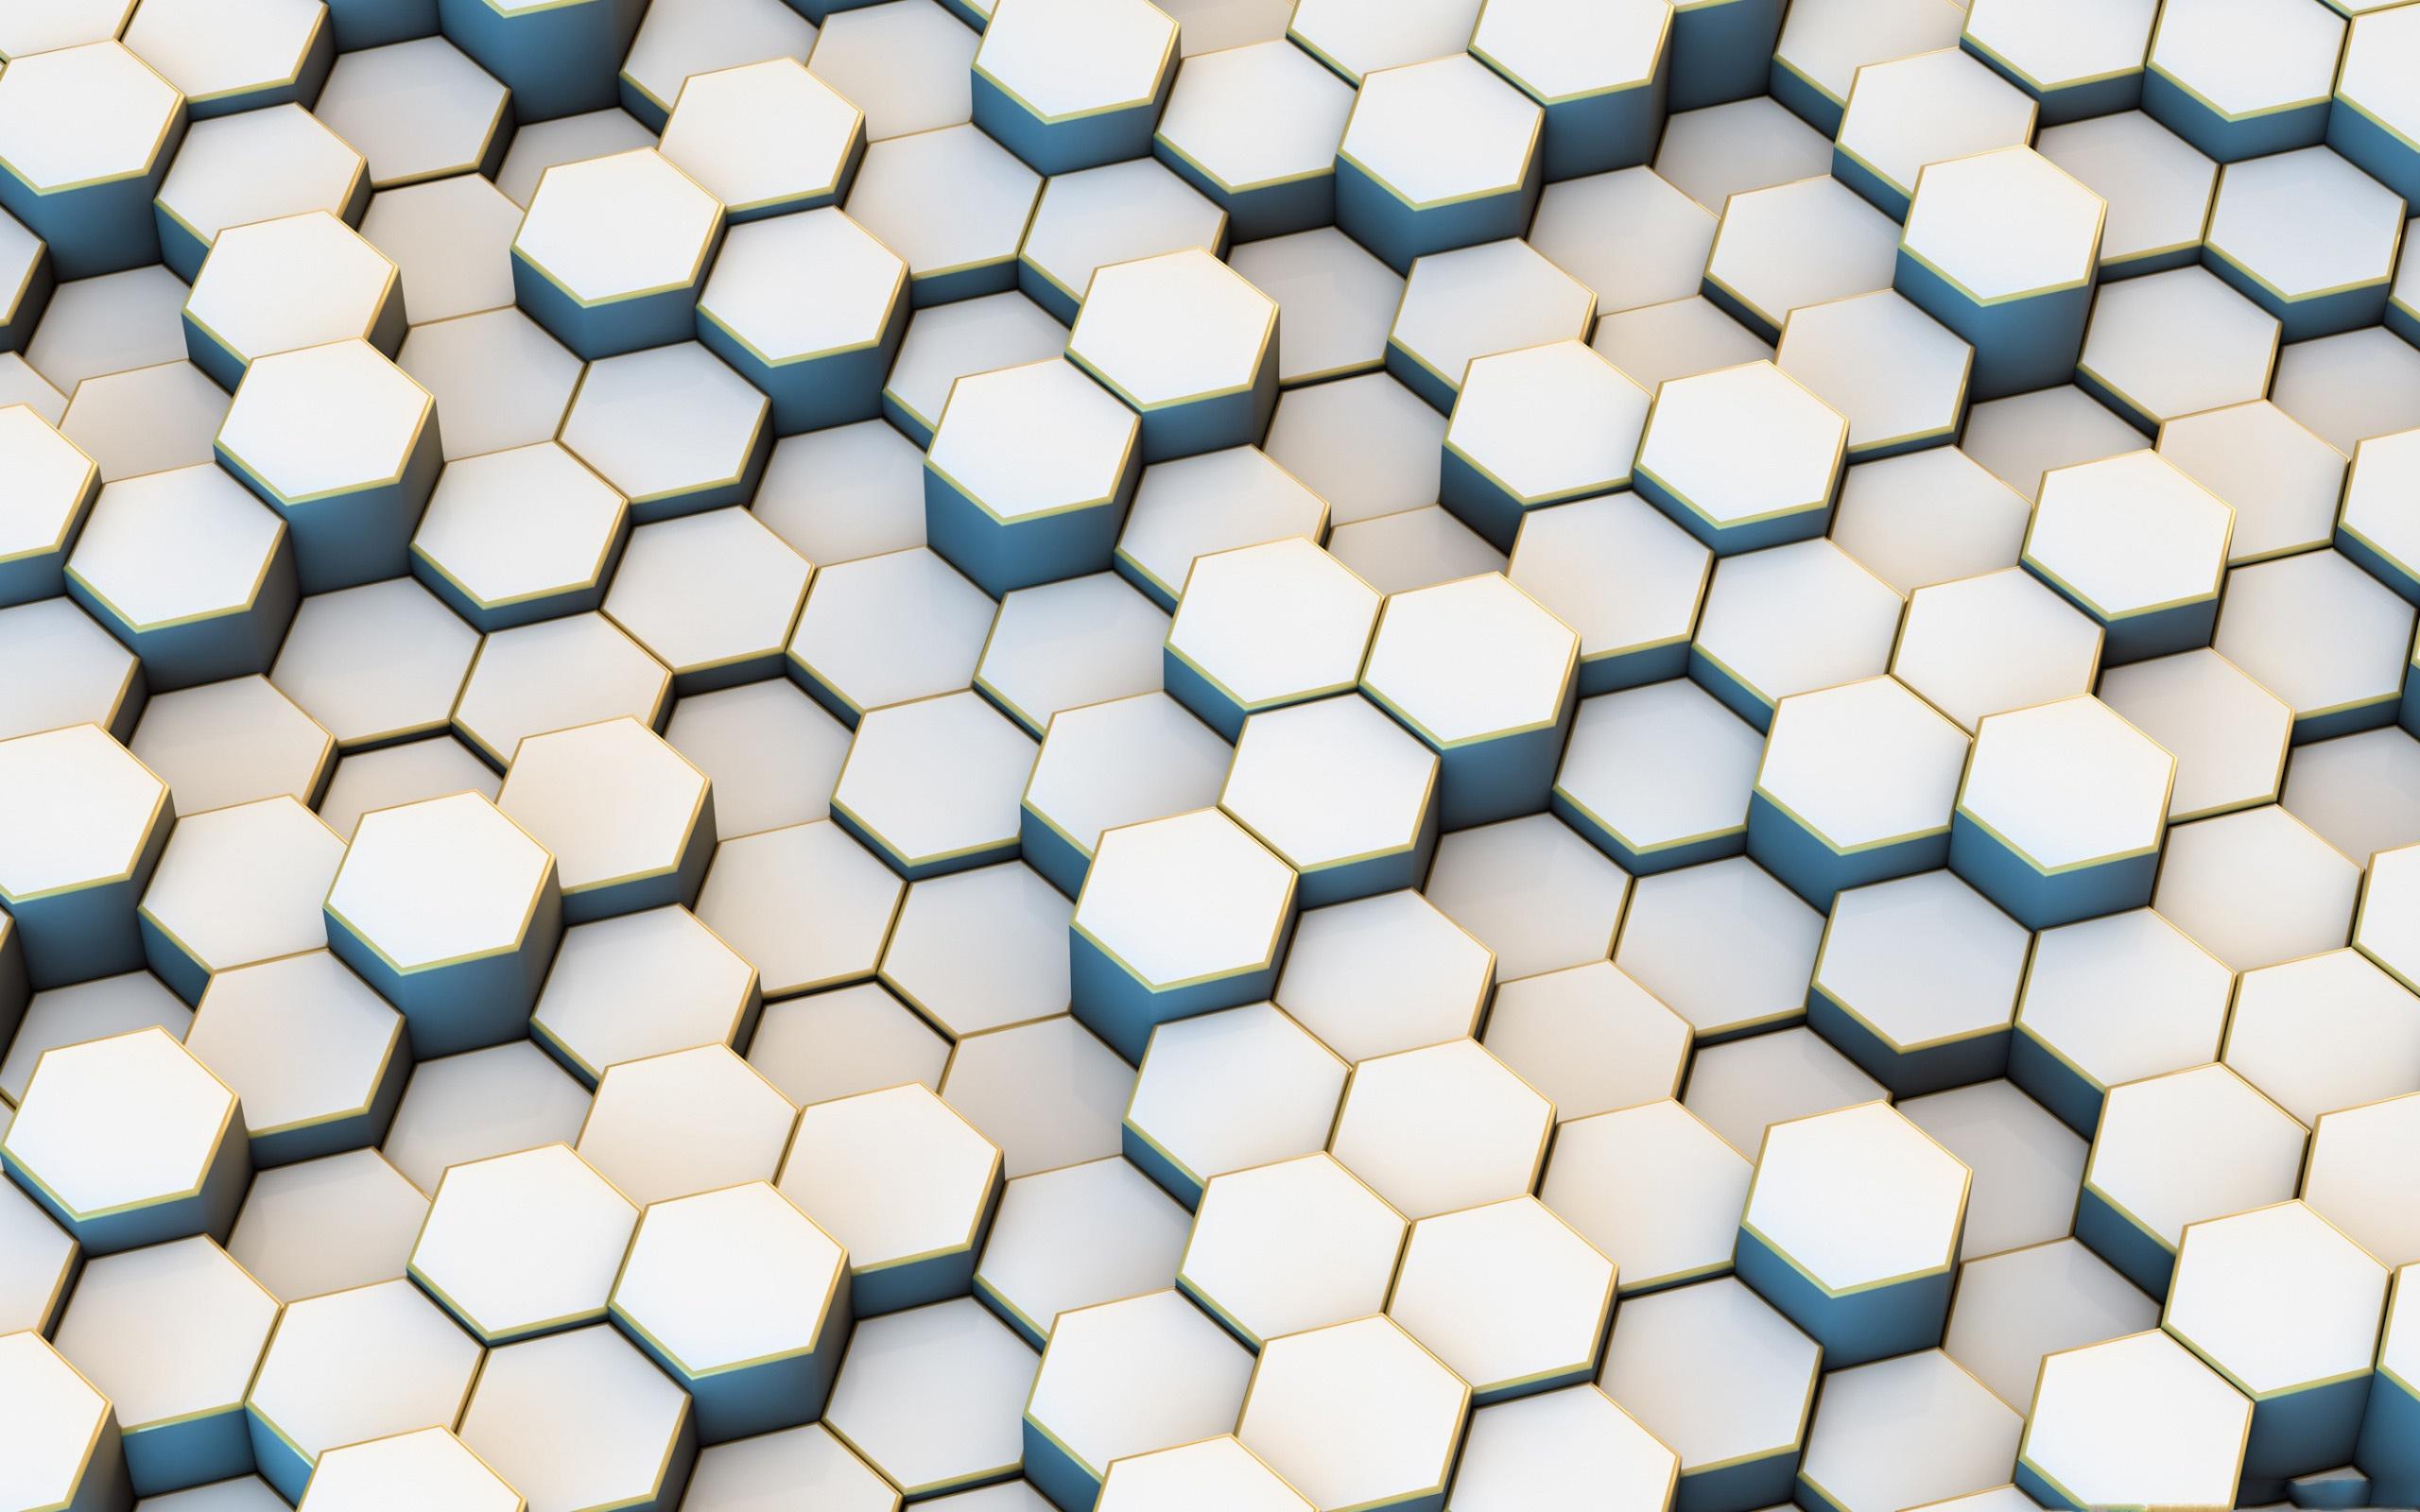 Artistic Digital Art Geometry Hexagon Pattern 2560x1600